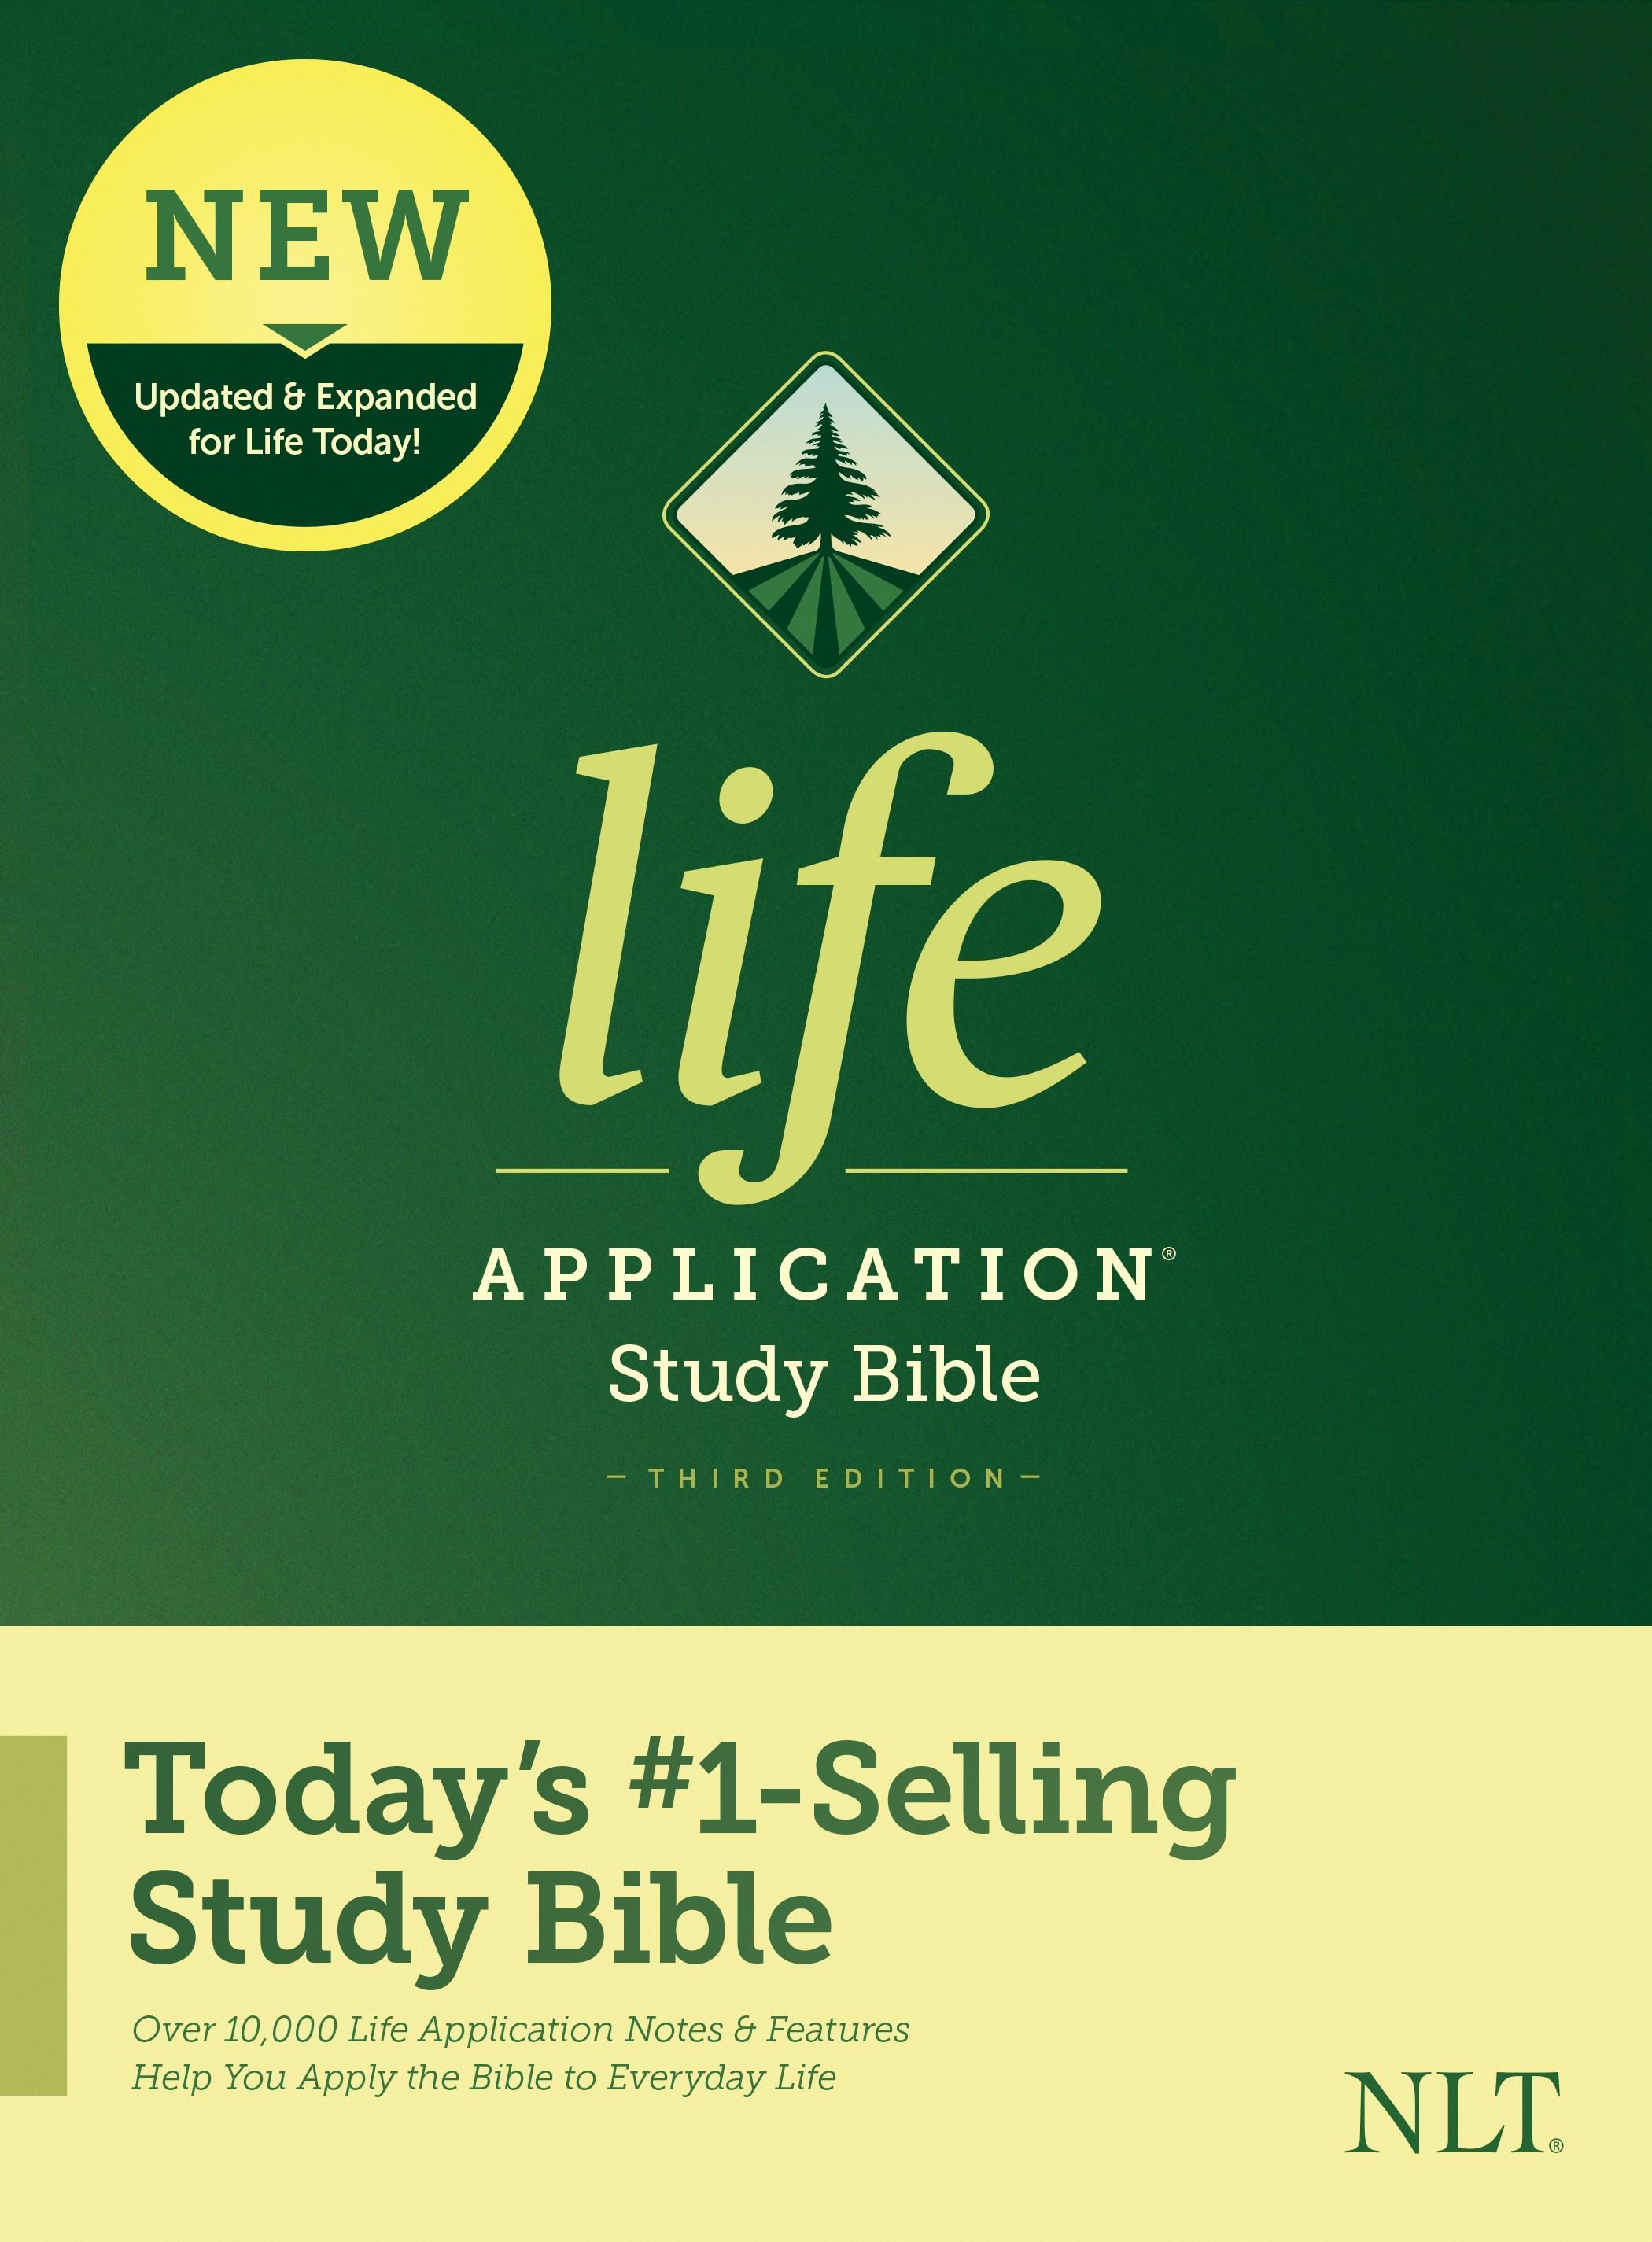 NLT Life Application Study Bible (Third Edition)-Hardcover